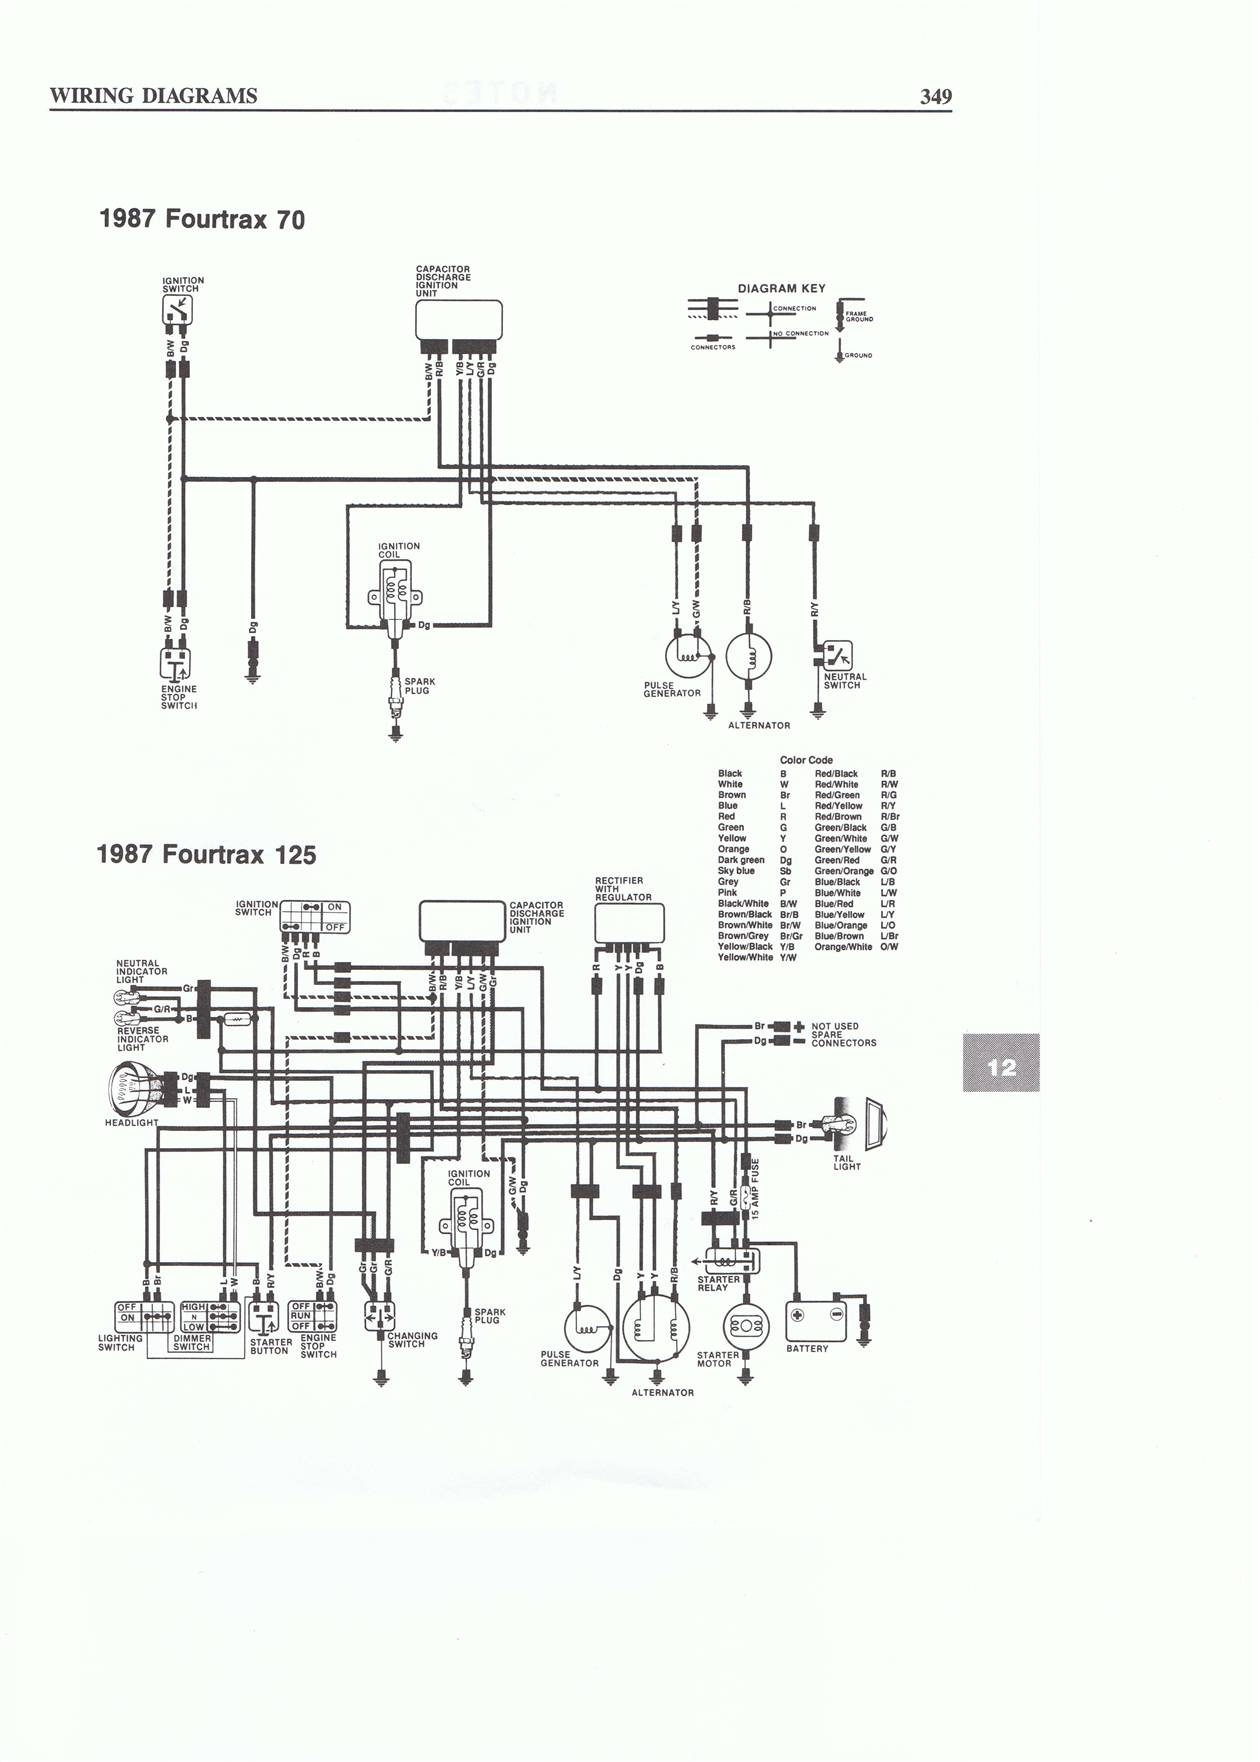 small resolution of kazuma 50cc wiring diagram wiring diagrams roketa 90cc atv wiring diagram kazuma 150cc wiring diagram wiring